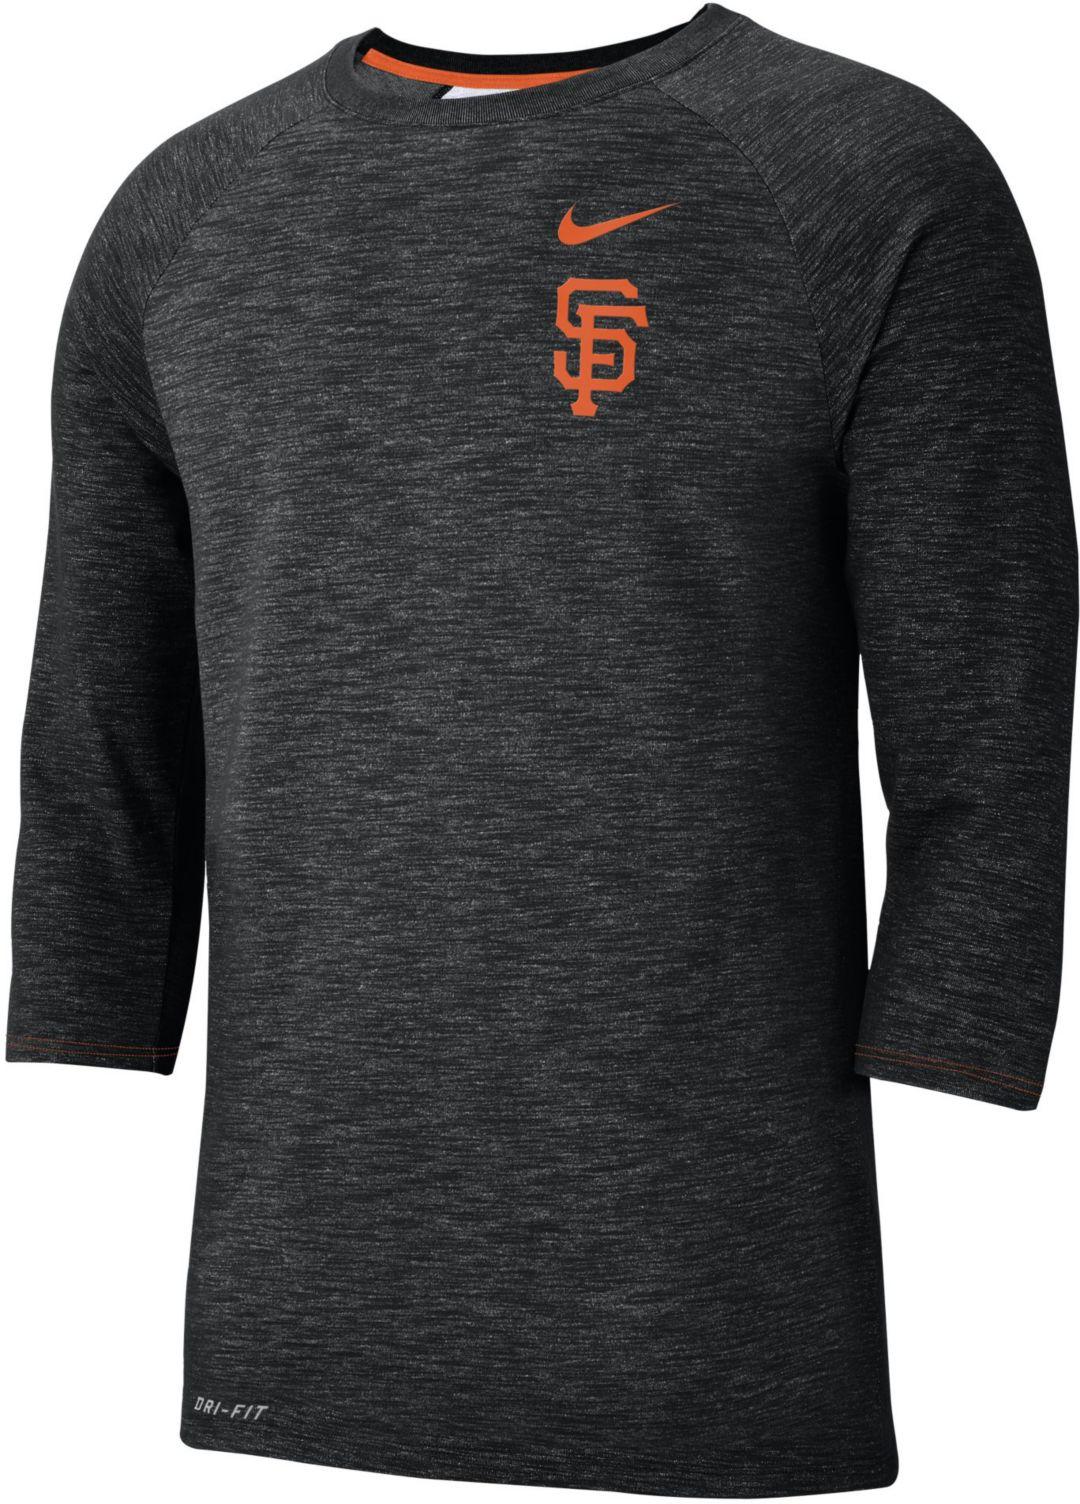 c6b29b94 Nike Men's San Francisco Giants Dri-FIT Slub Three-Quarter Sleeve Shirt